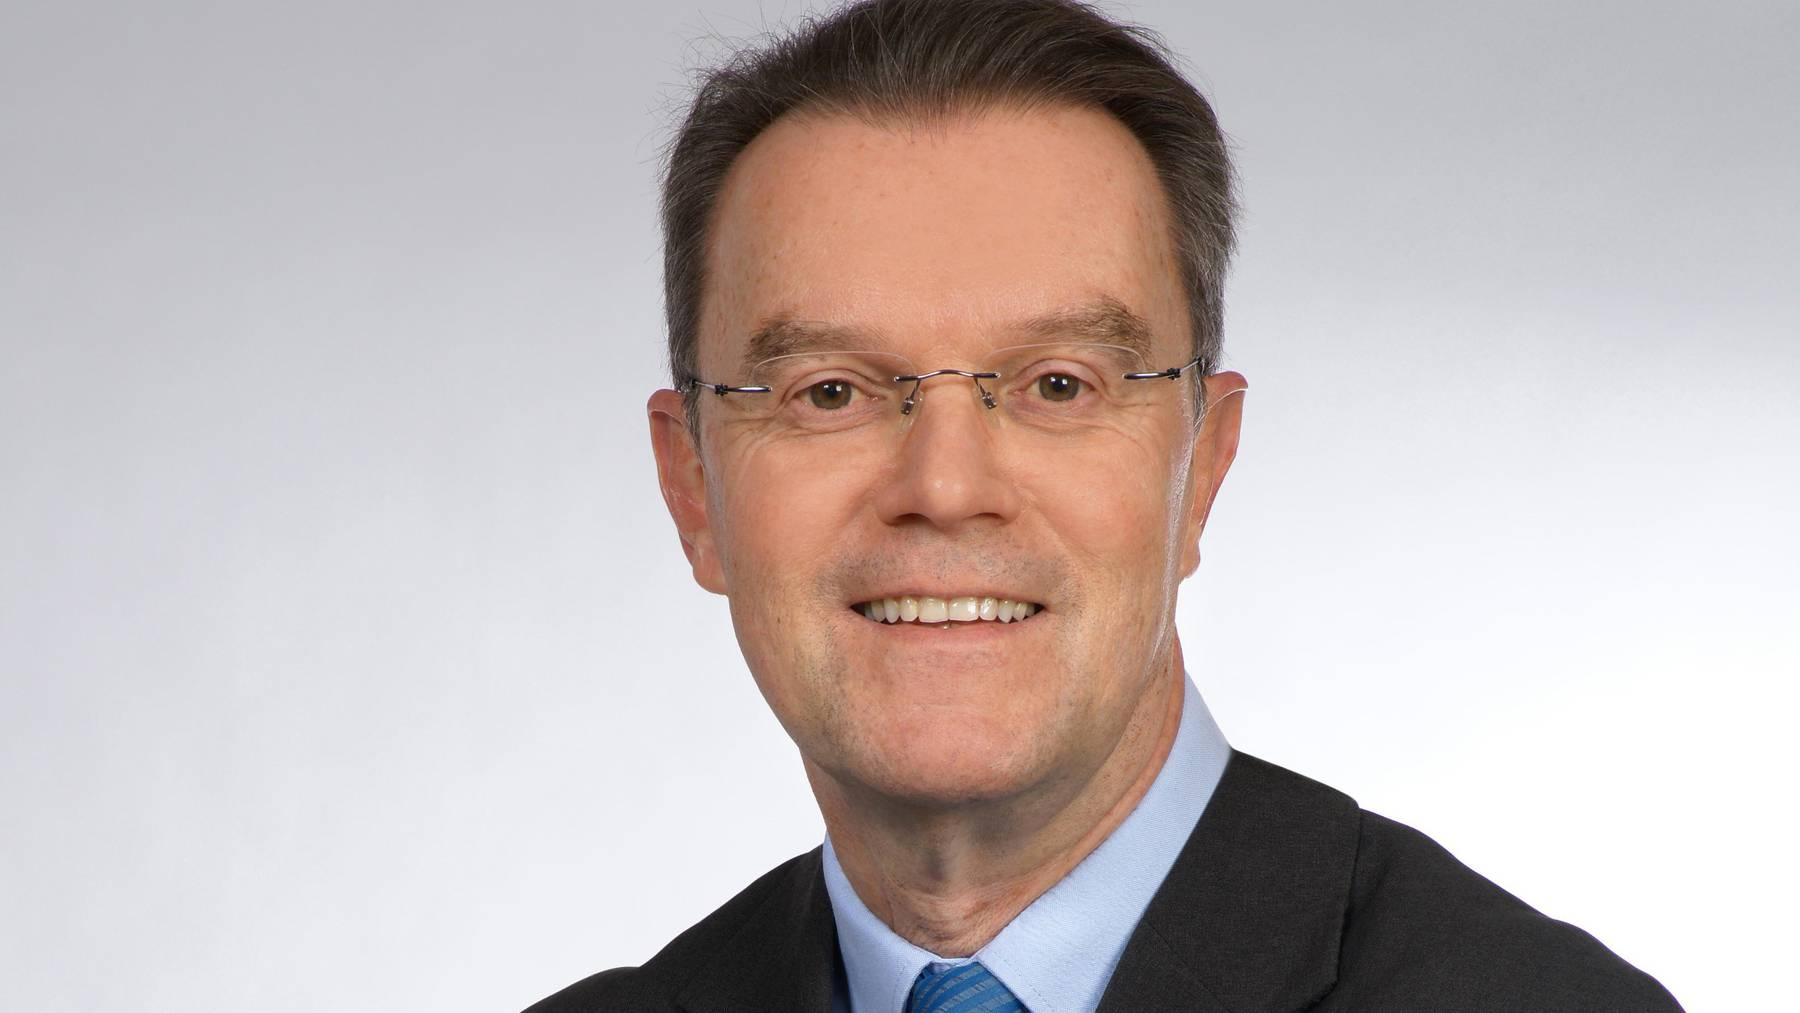 Erwin Böhi